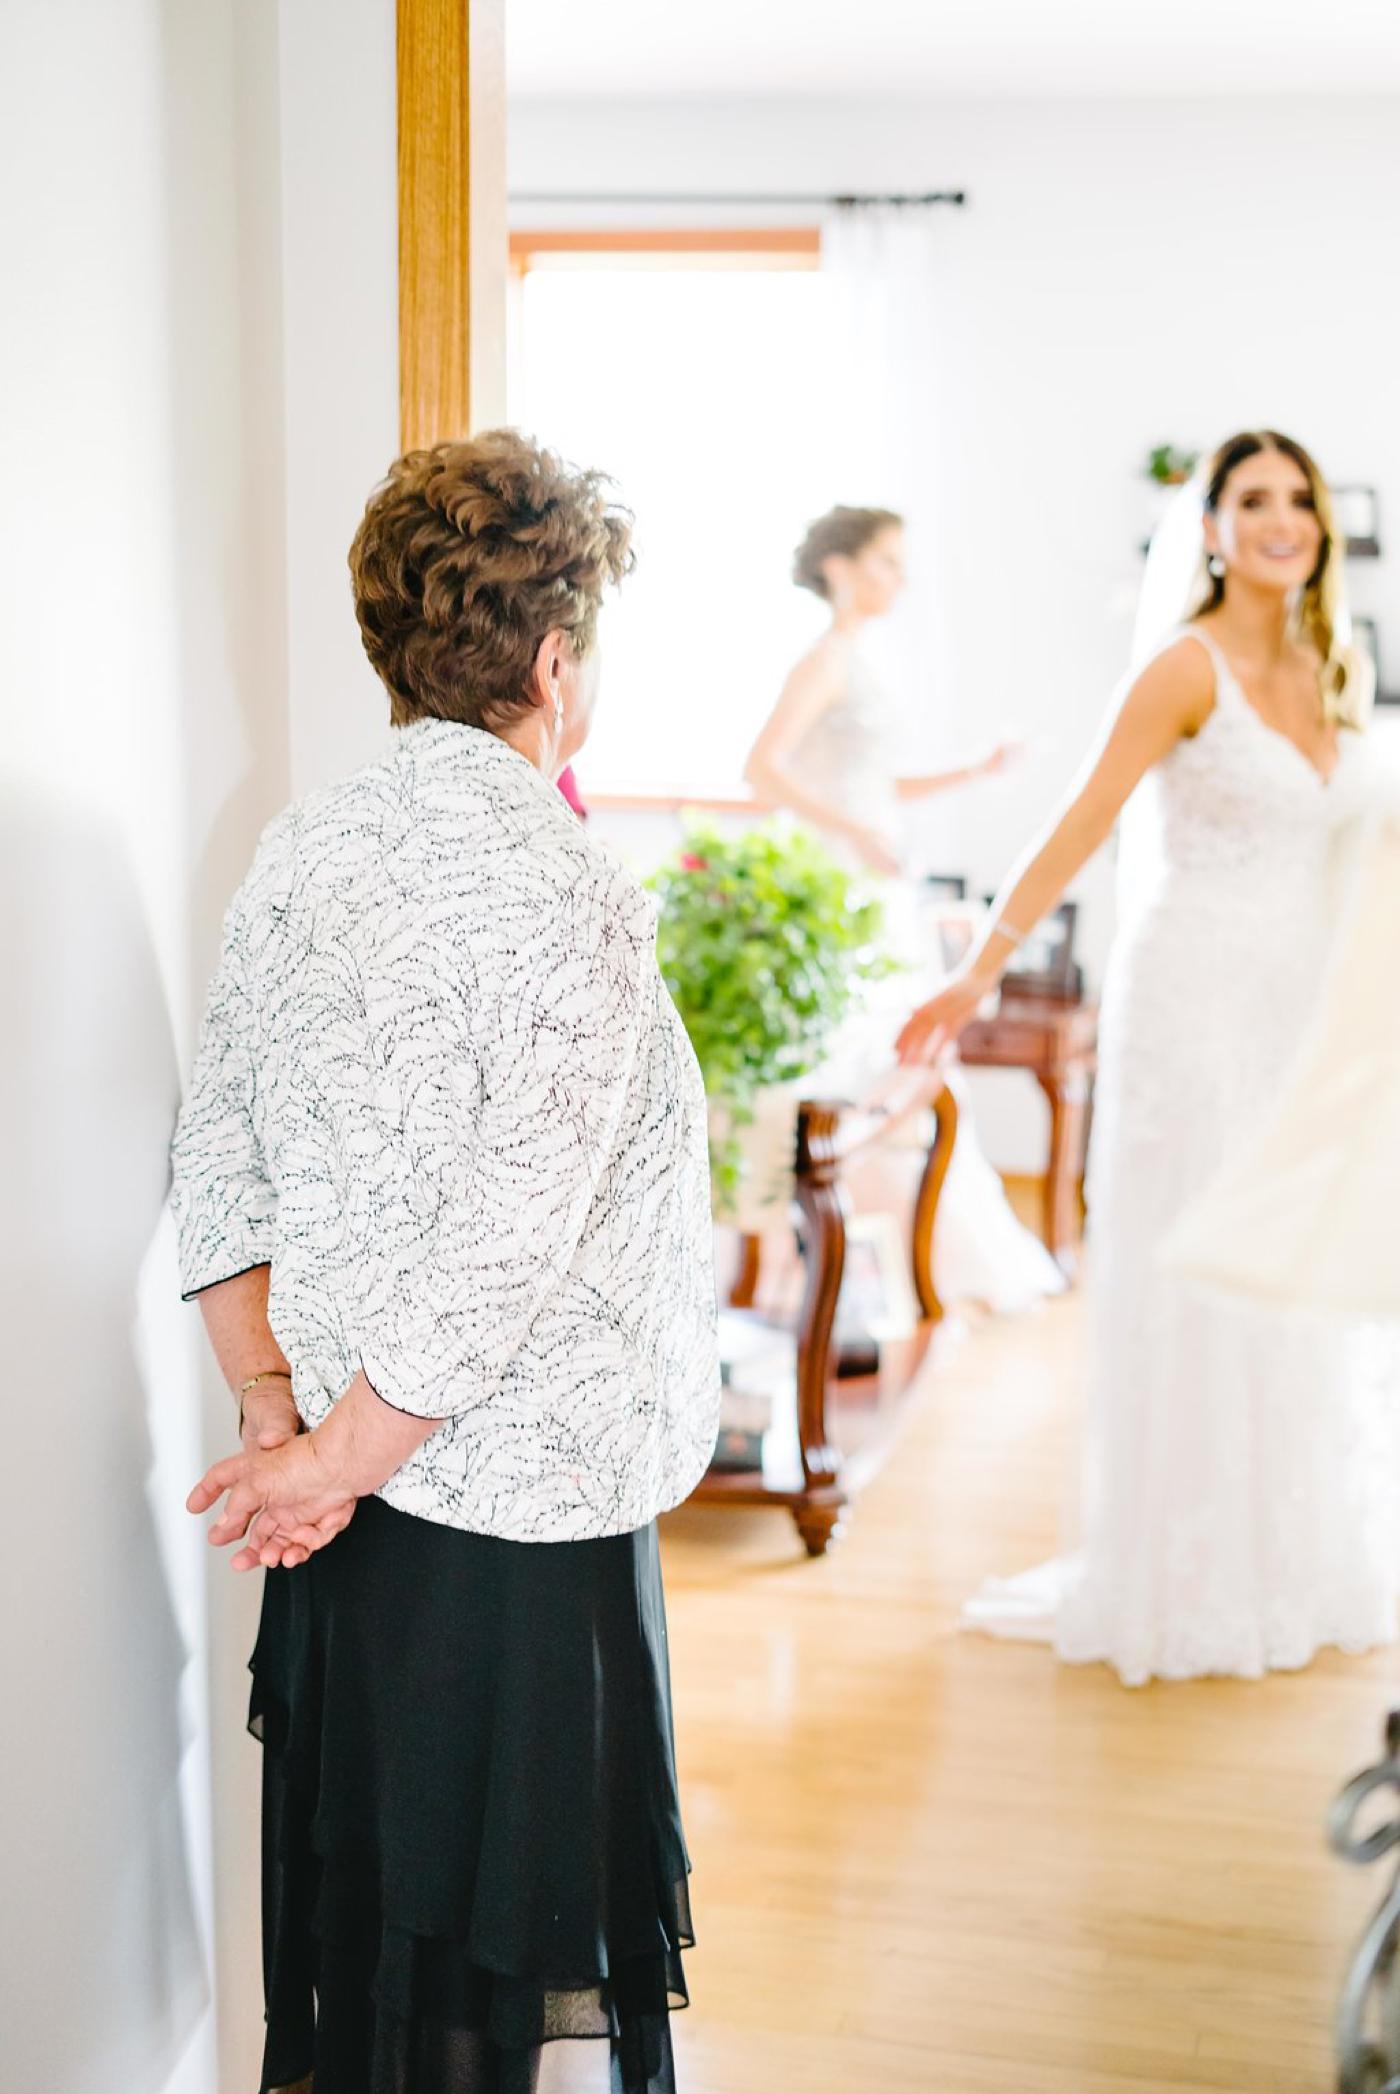 chicago-fine-art-wedding-photography-duncan23